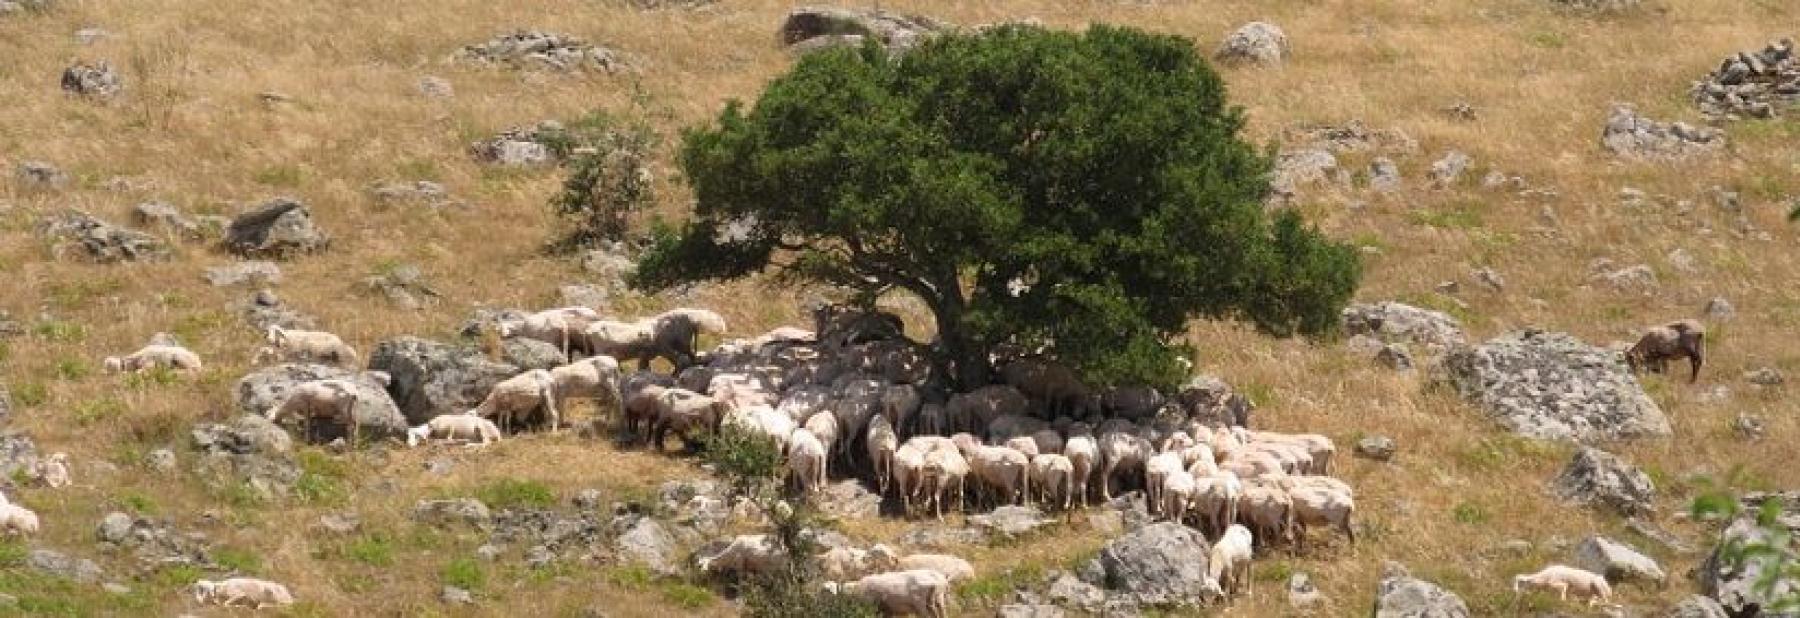 pecore_al_pascolo